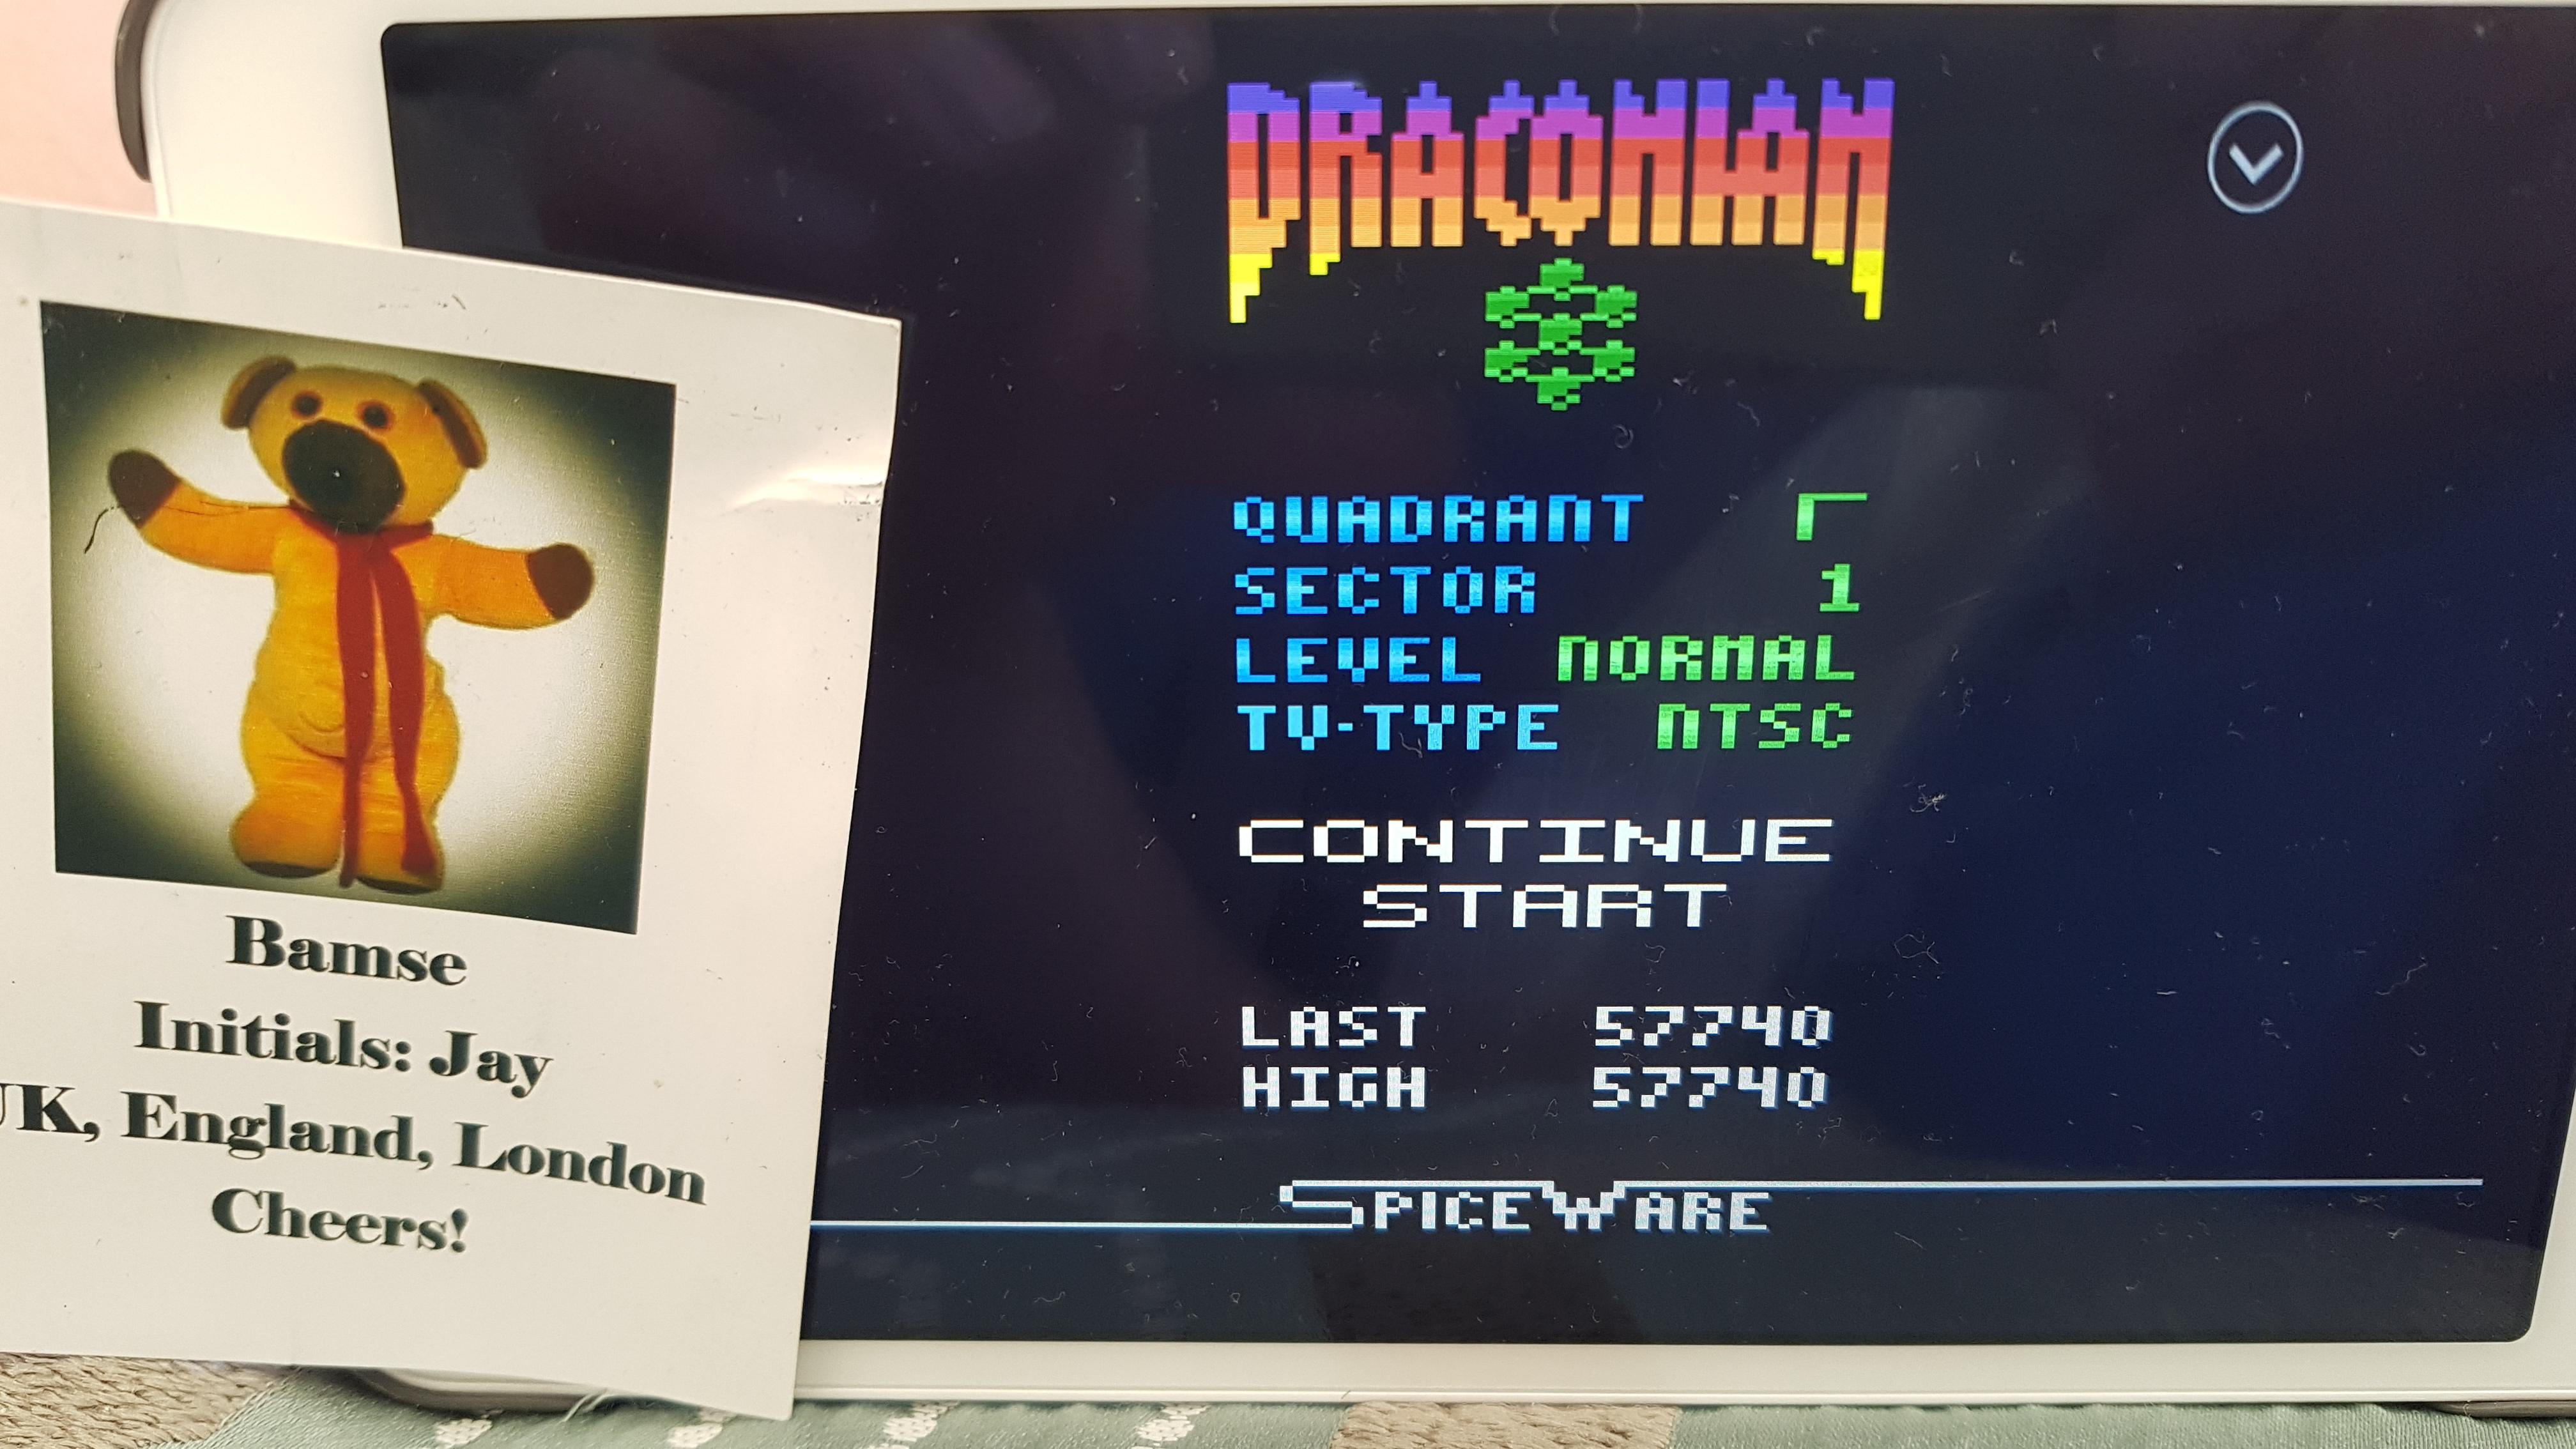 Bamse: Draconian: Quadrant Gamma / Sector 1 [Normal] (Atari 2600 Emulated) 57,740 points on 2019-07-04 10:34:04